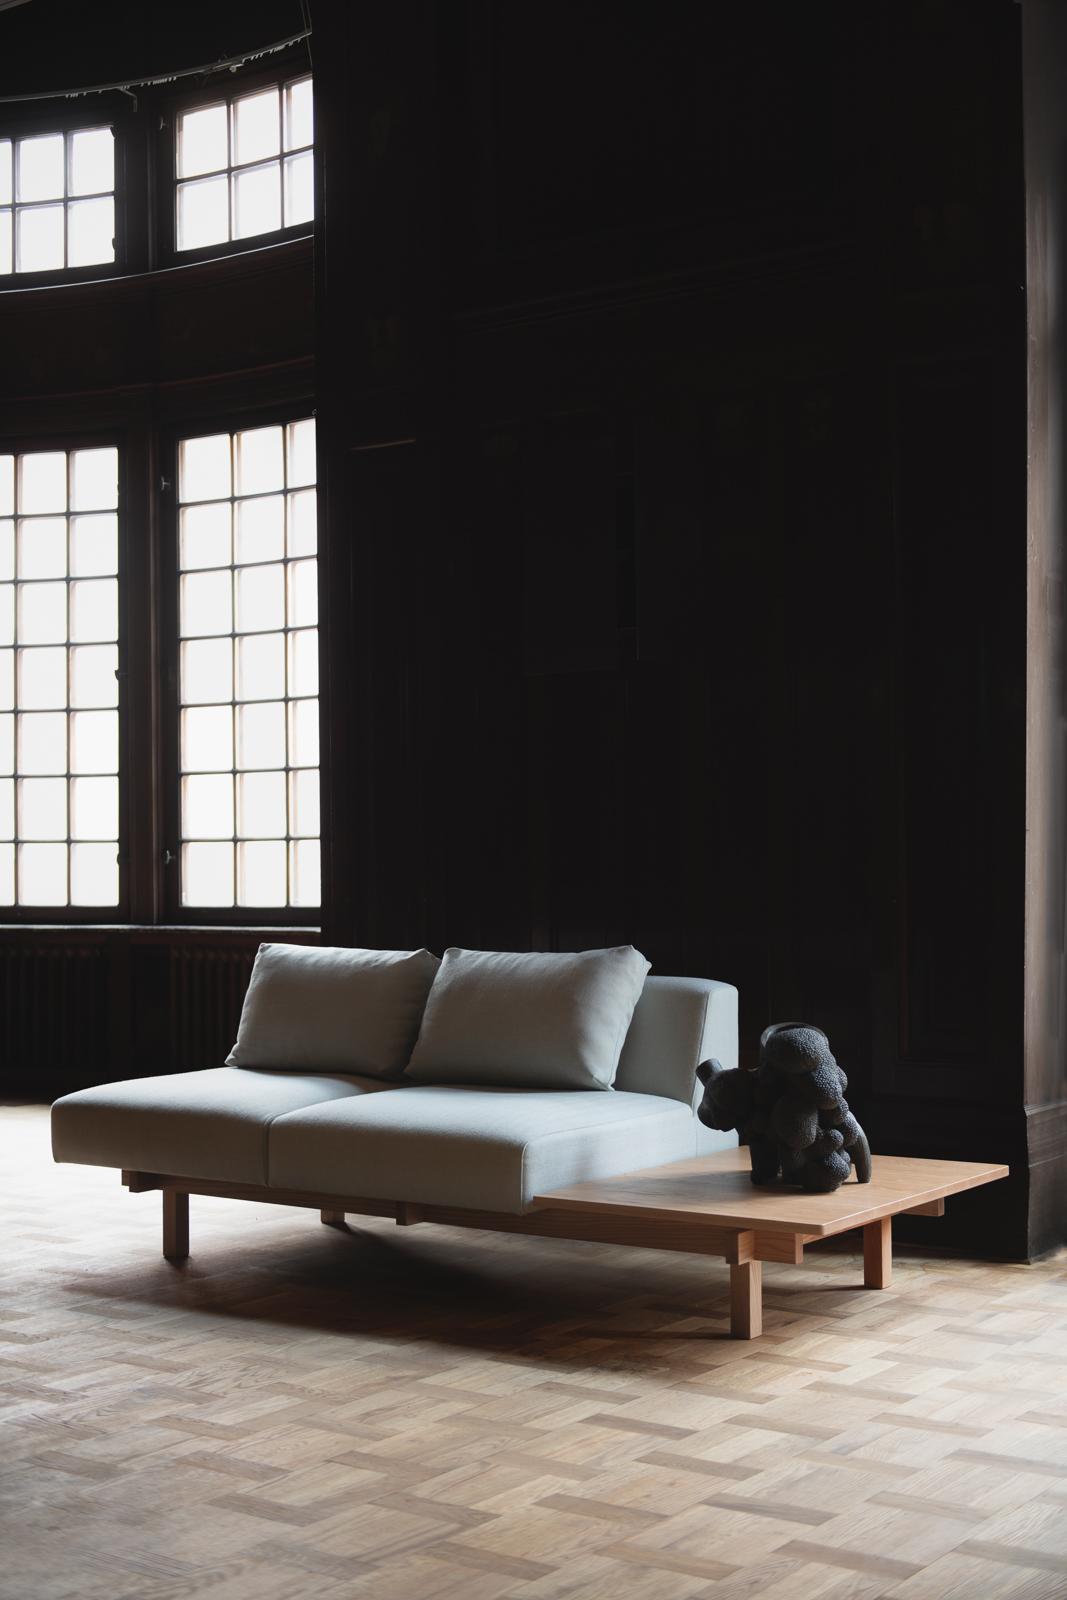 The Raft Sofa by Keiji Ashizawa